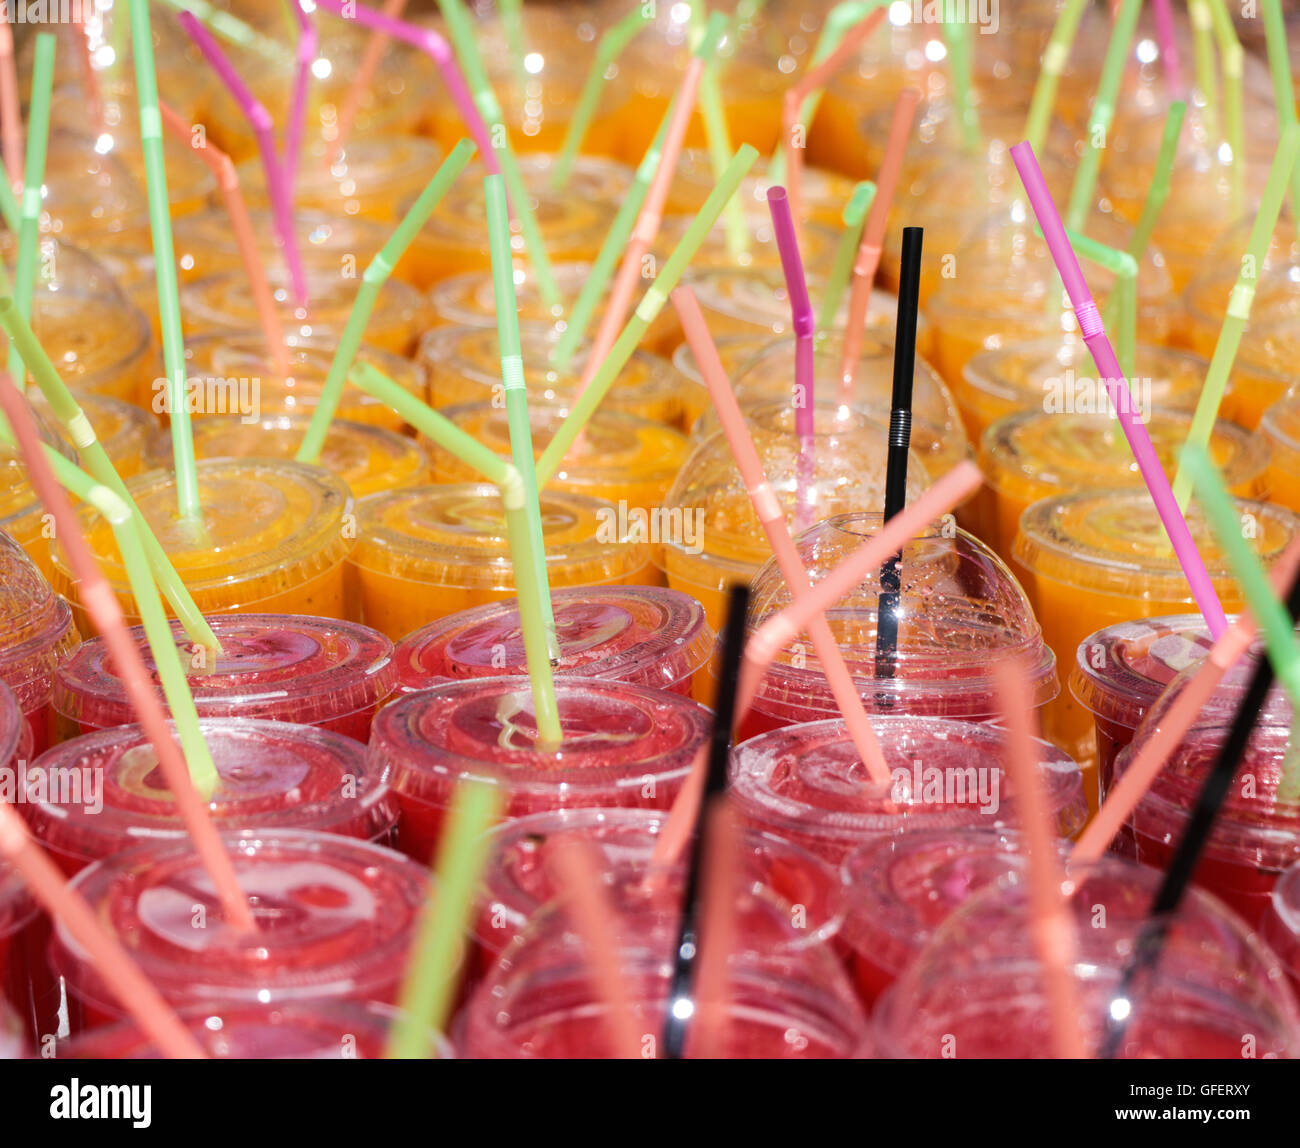 Fruit juices & Slurpy on show at Shoreditch Market in London, England - Stock Image